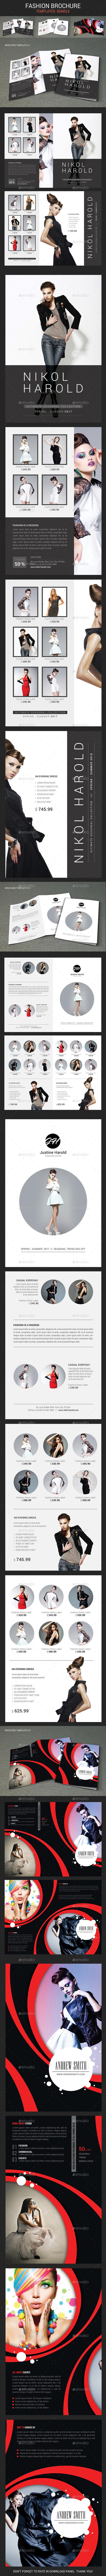 Fashion Brochure Bundle 2 - Brochures Print Templates